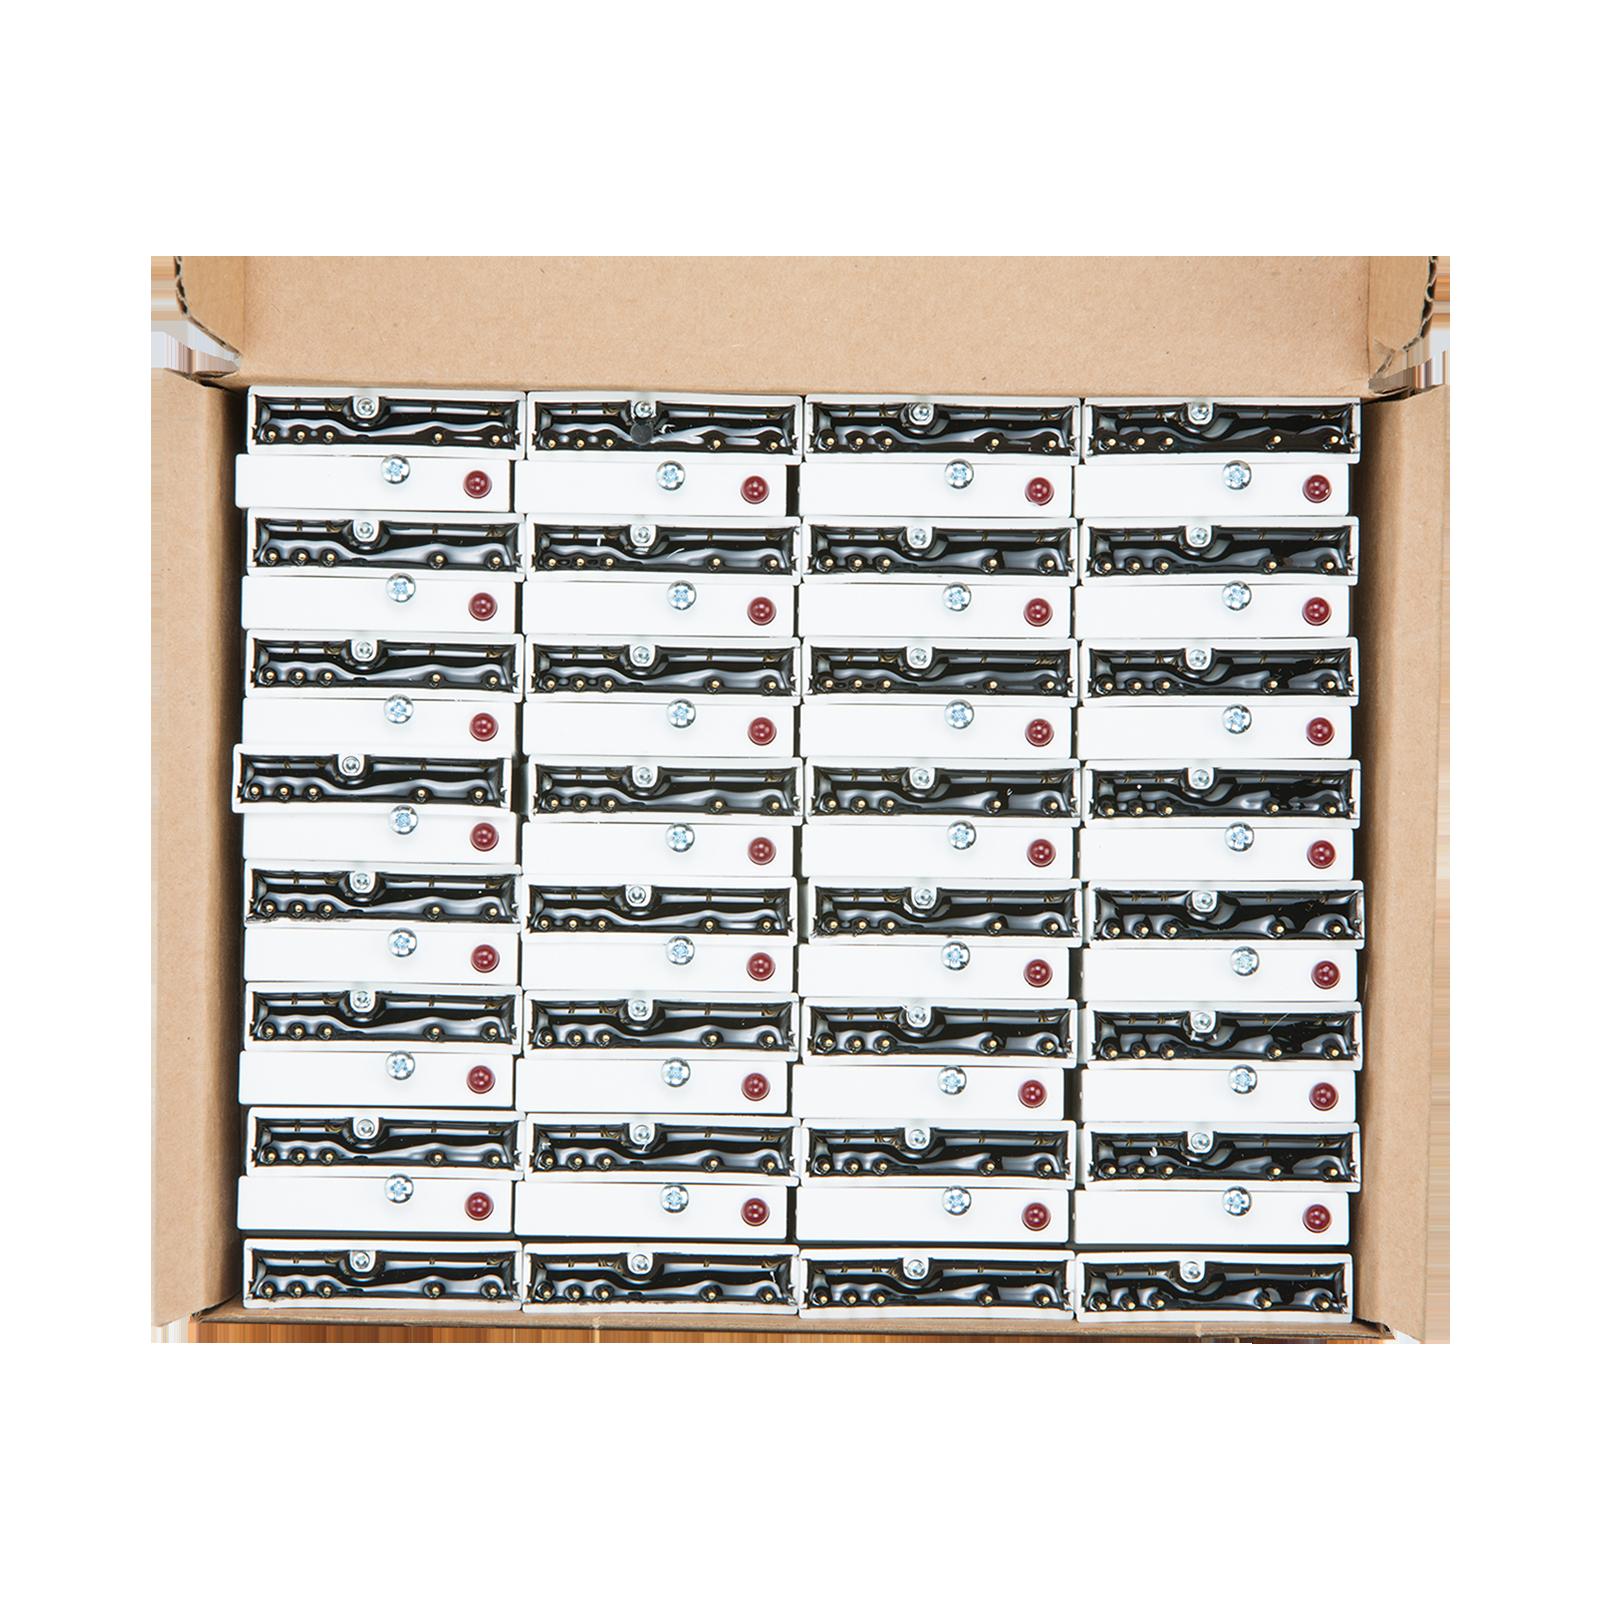 Opto22 G4idc5 G4 Dc Input 10 32 Vdc 5 Logic Opto 22 Wiring Diagram Previous